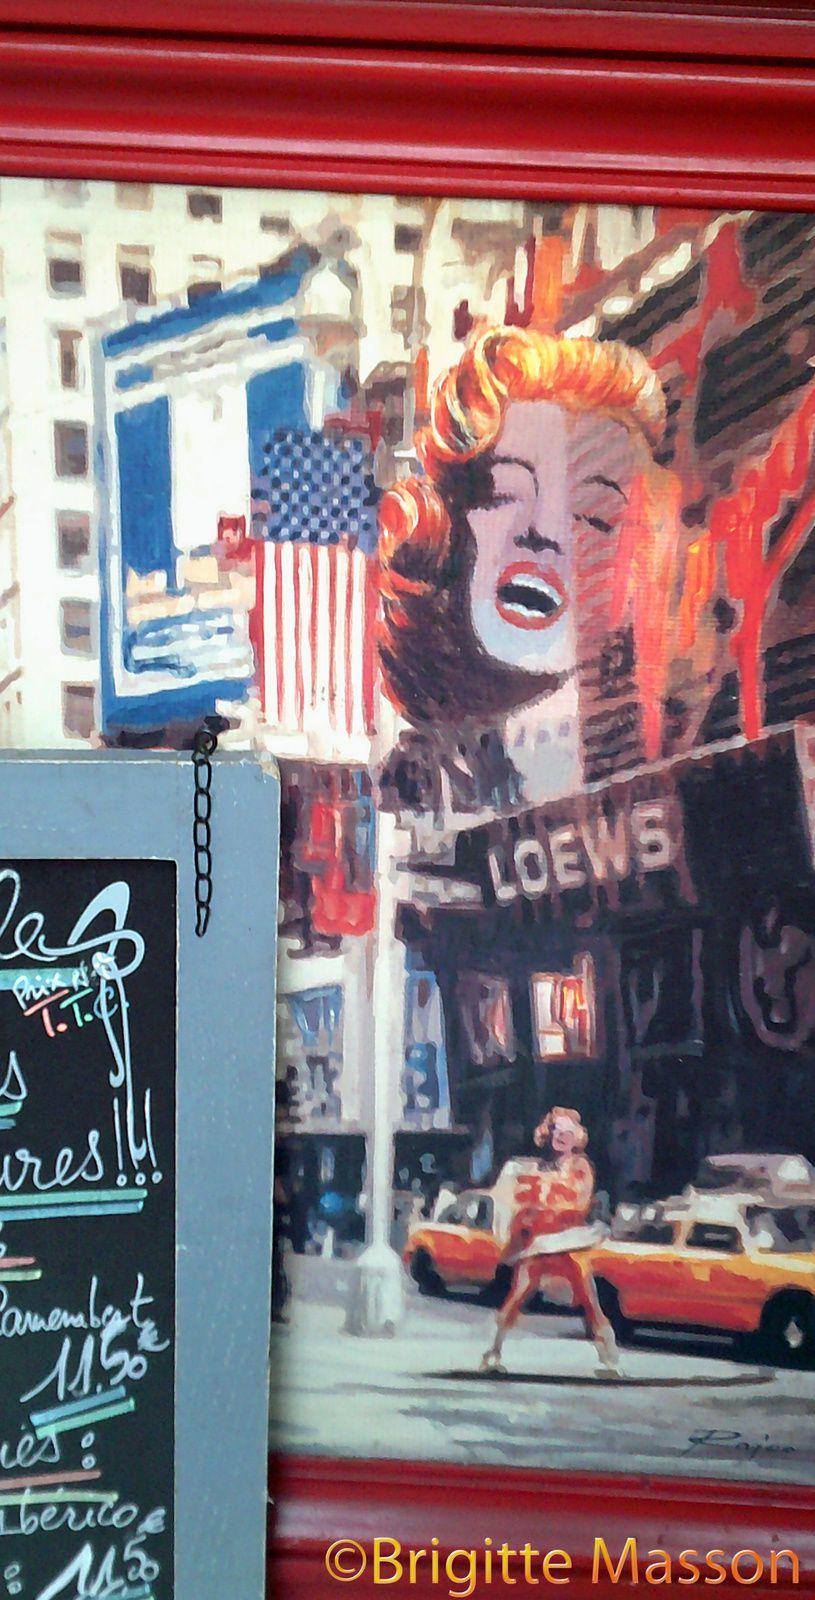 Marilyn et le camembert